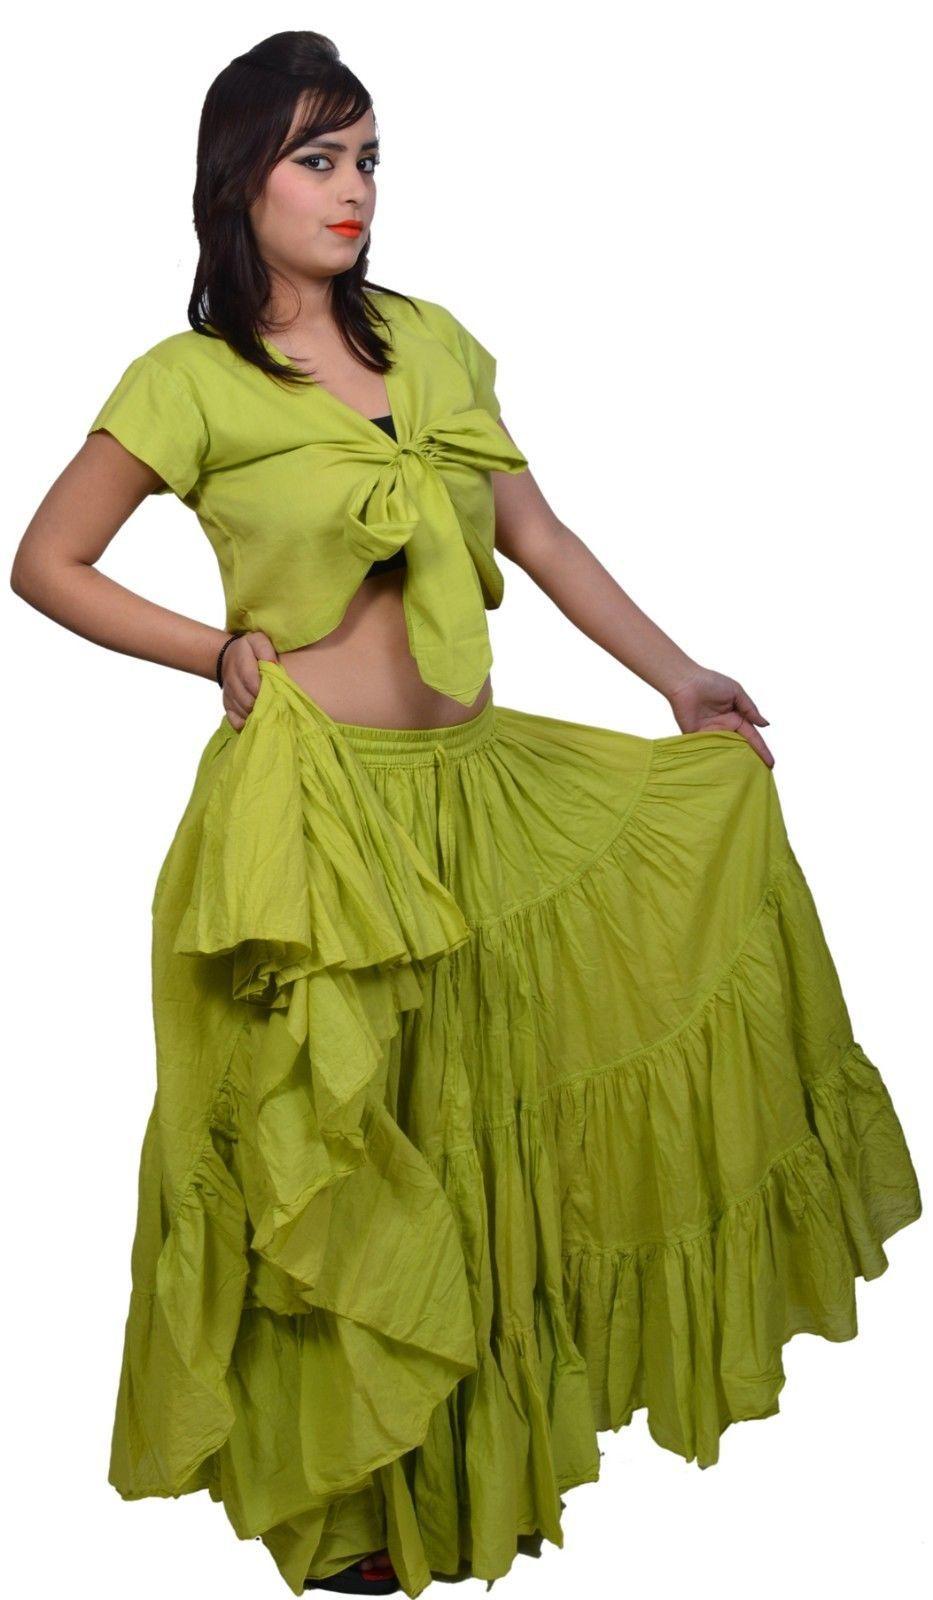 Bottle Green Polka Dot 25 yard gypsy skirt cotton belly dance tribal costume